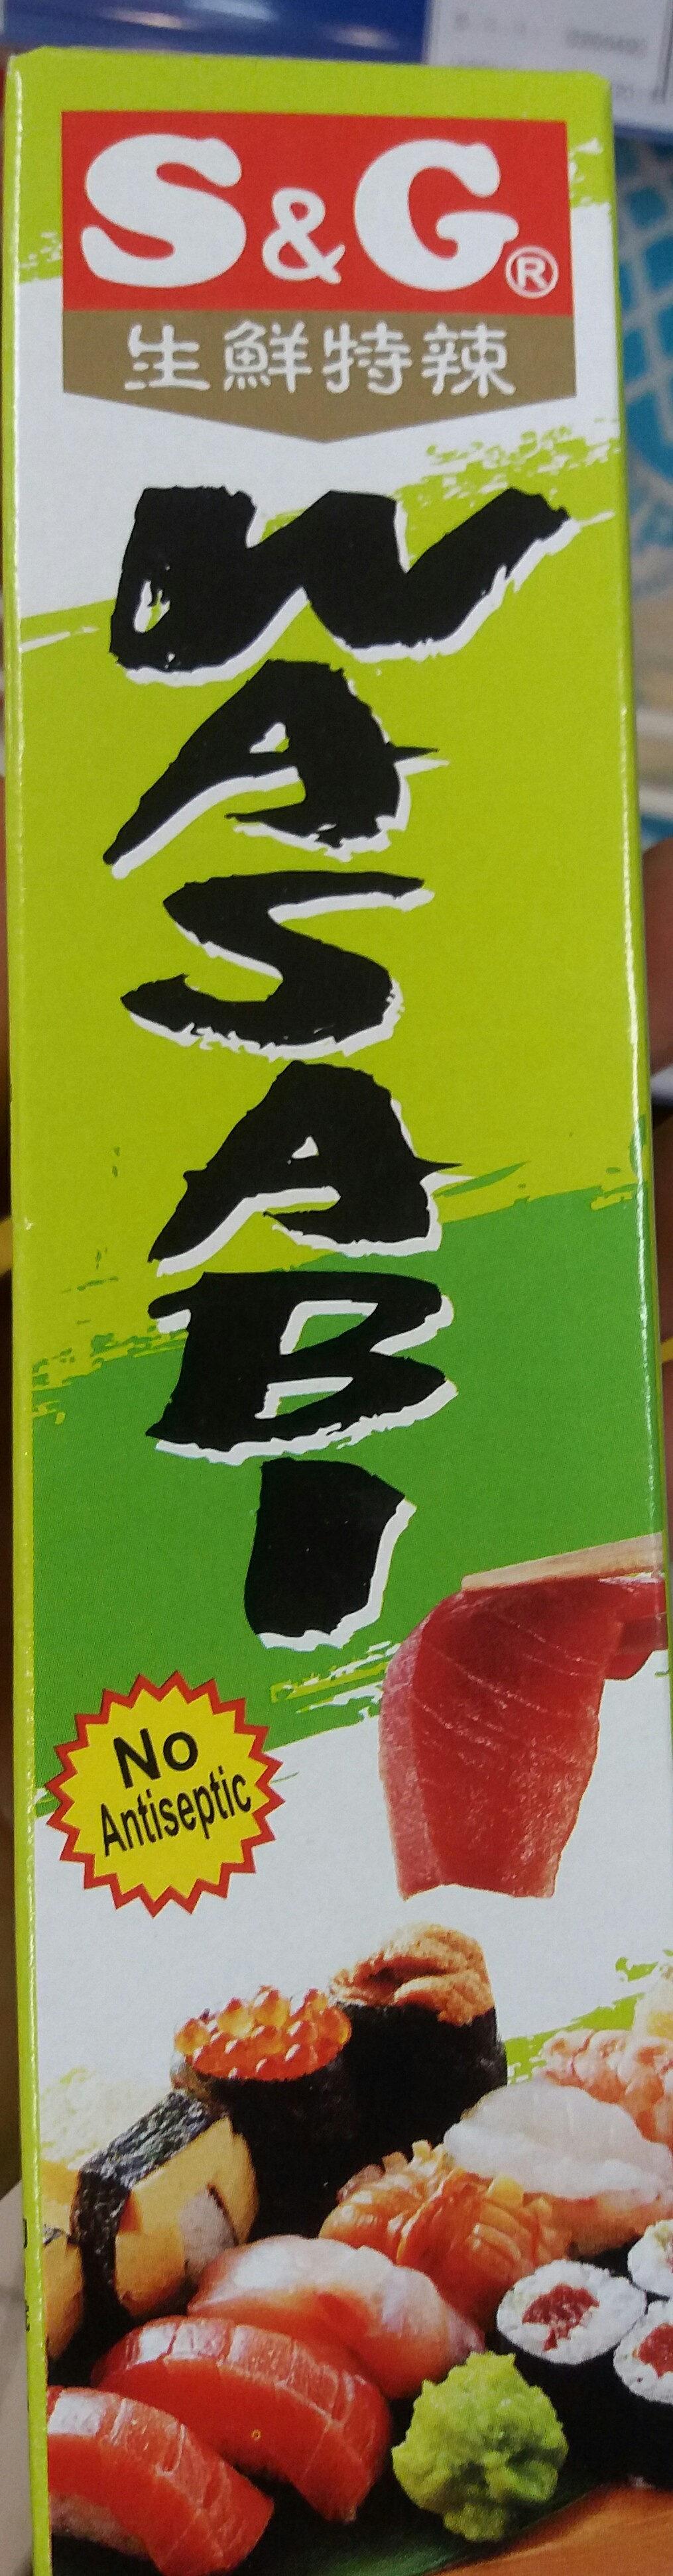 wasabi sauce - Sản phẩm - en